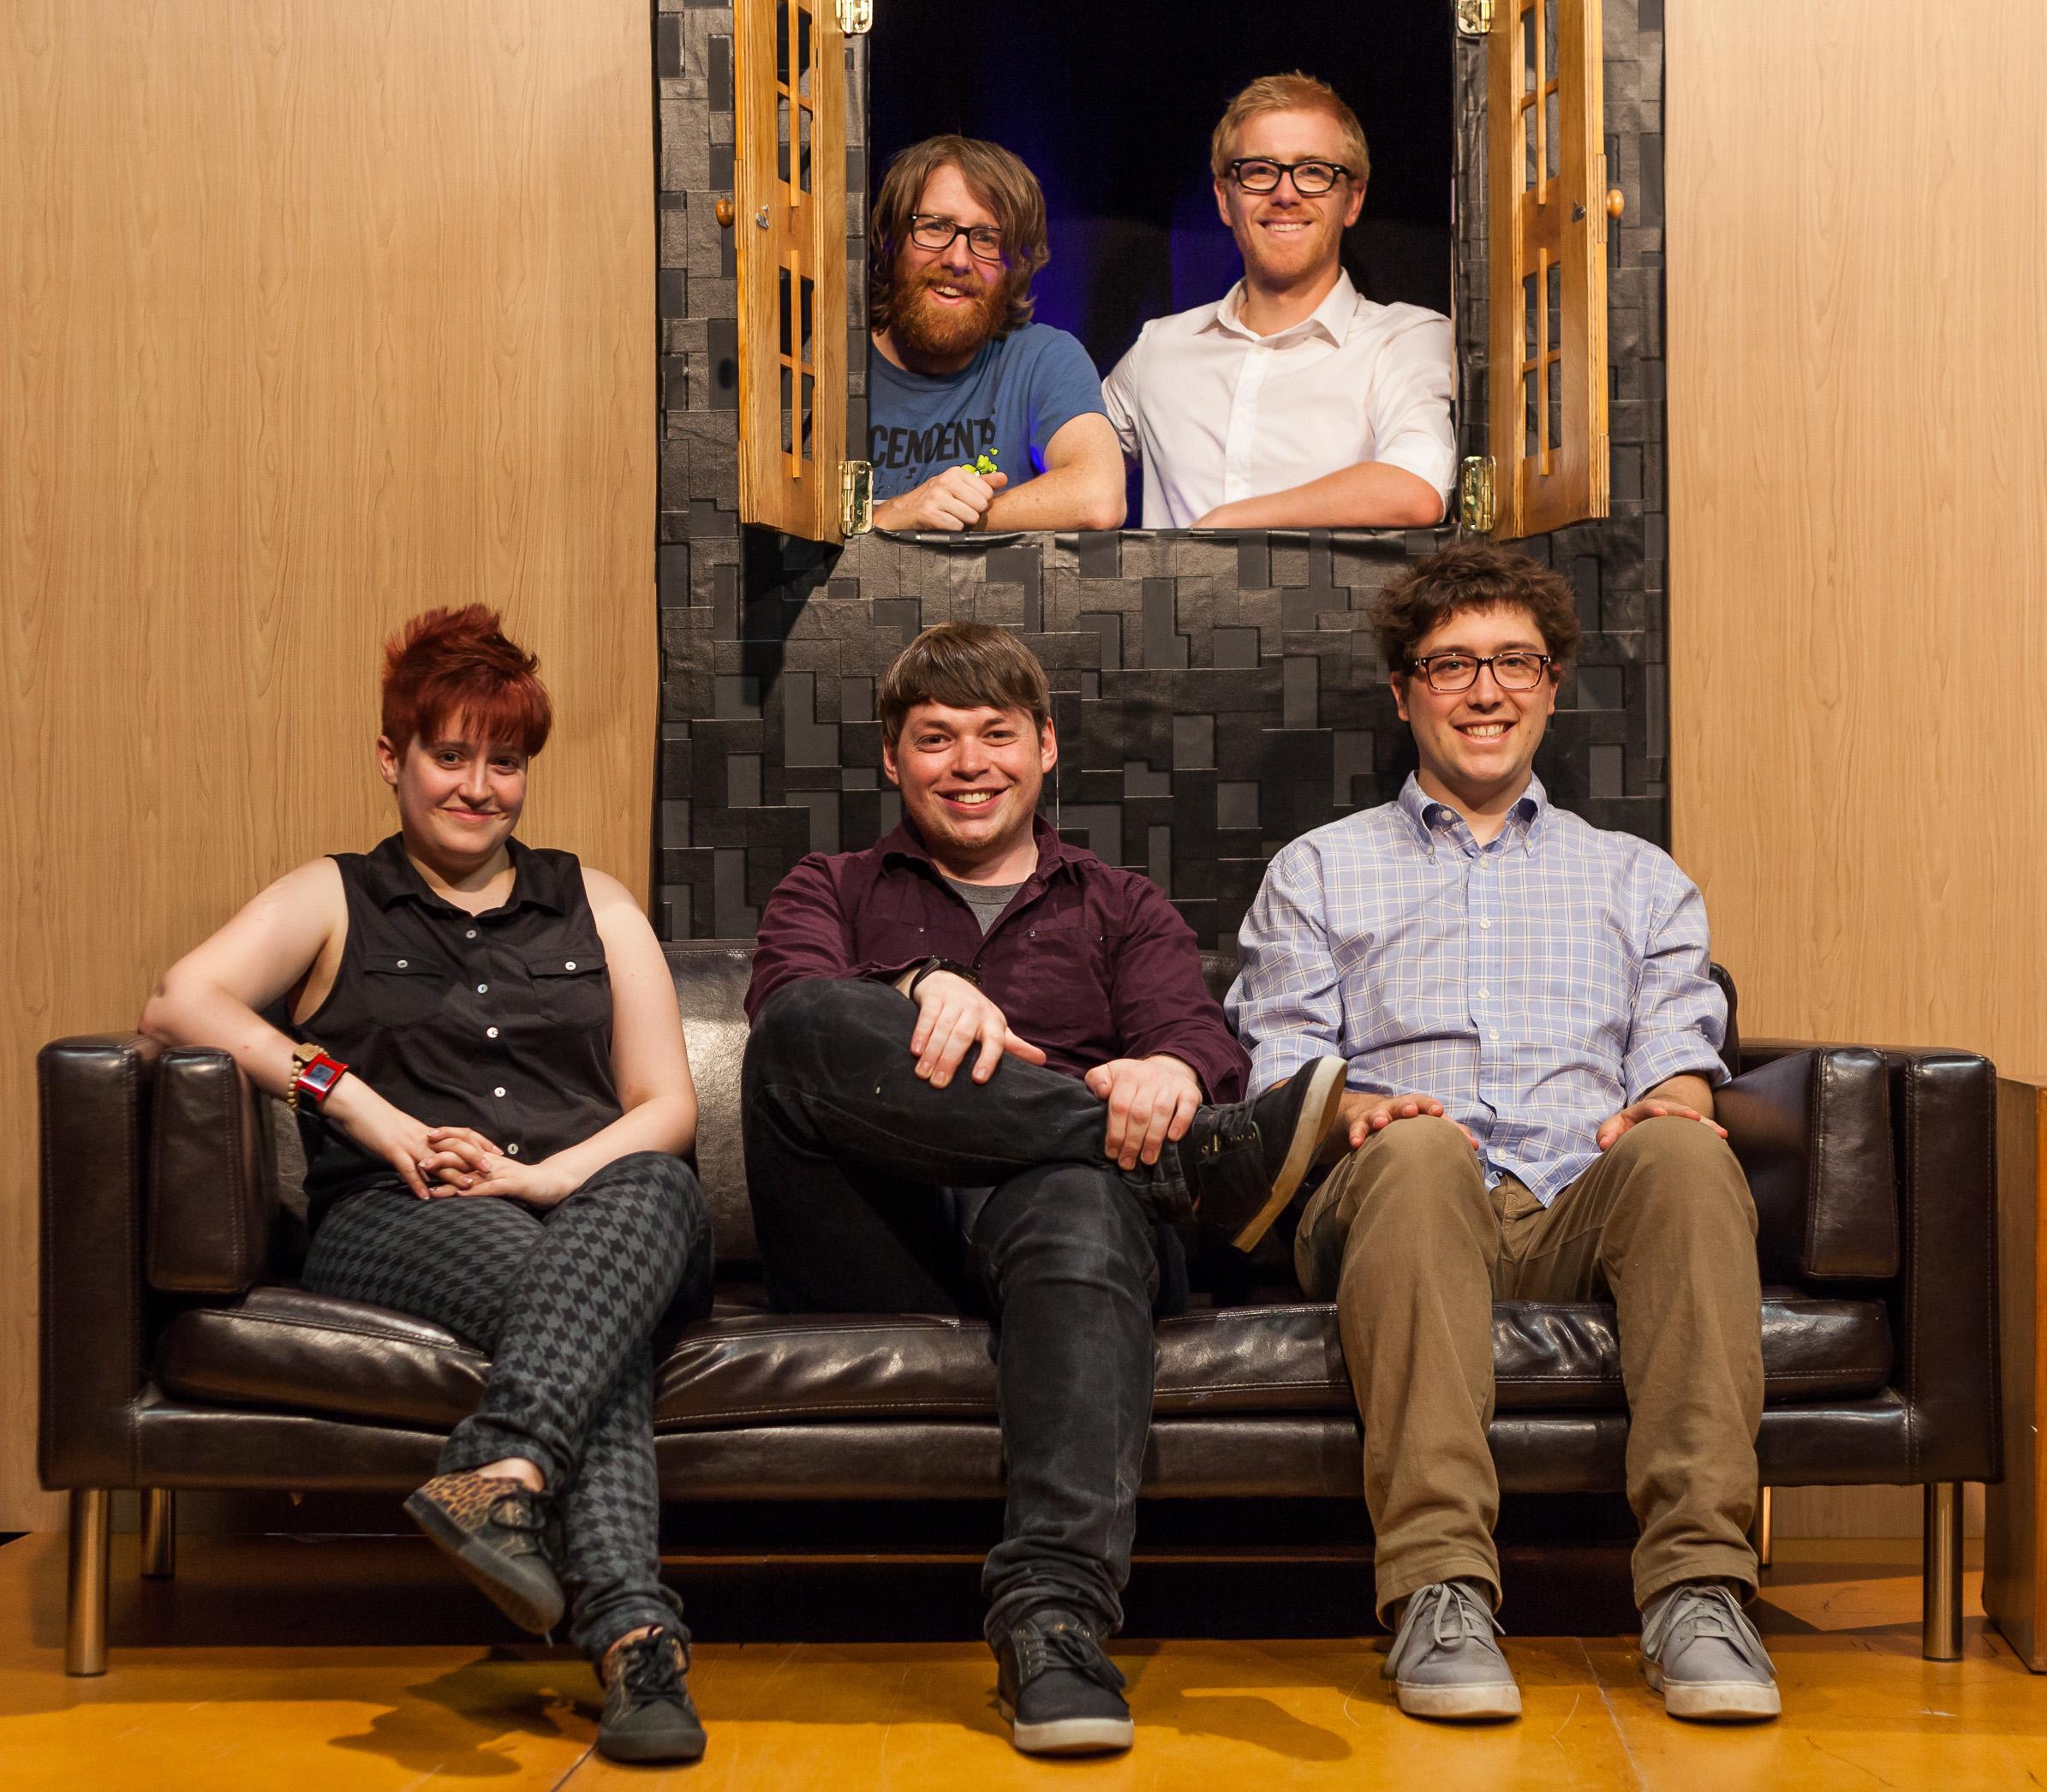 Matt Stewart, Andy Matthews, Bec Petraitis, Evan Munro-Smith & Alasdair Tremblay-Birchall (Left to right, top to bottom)